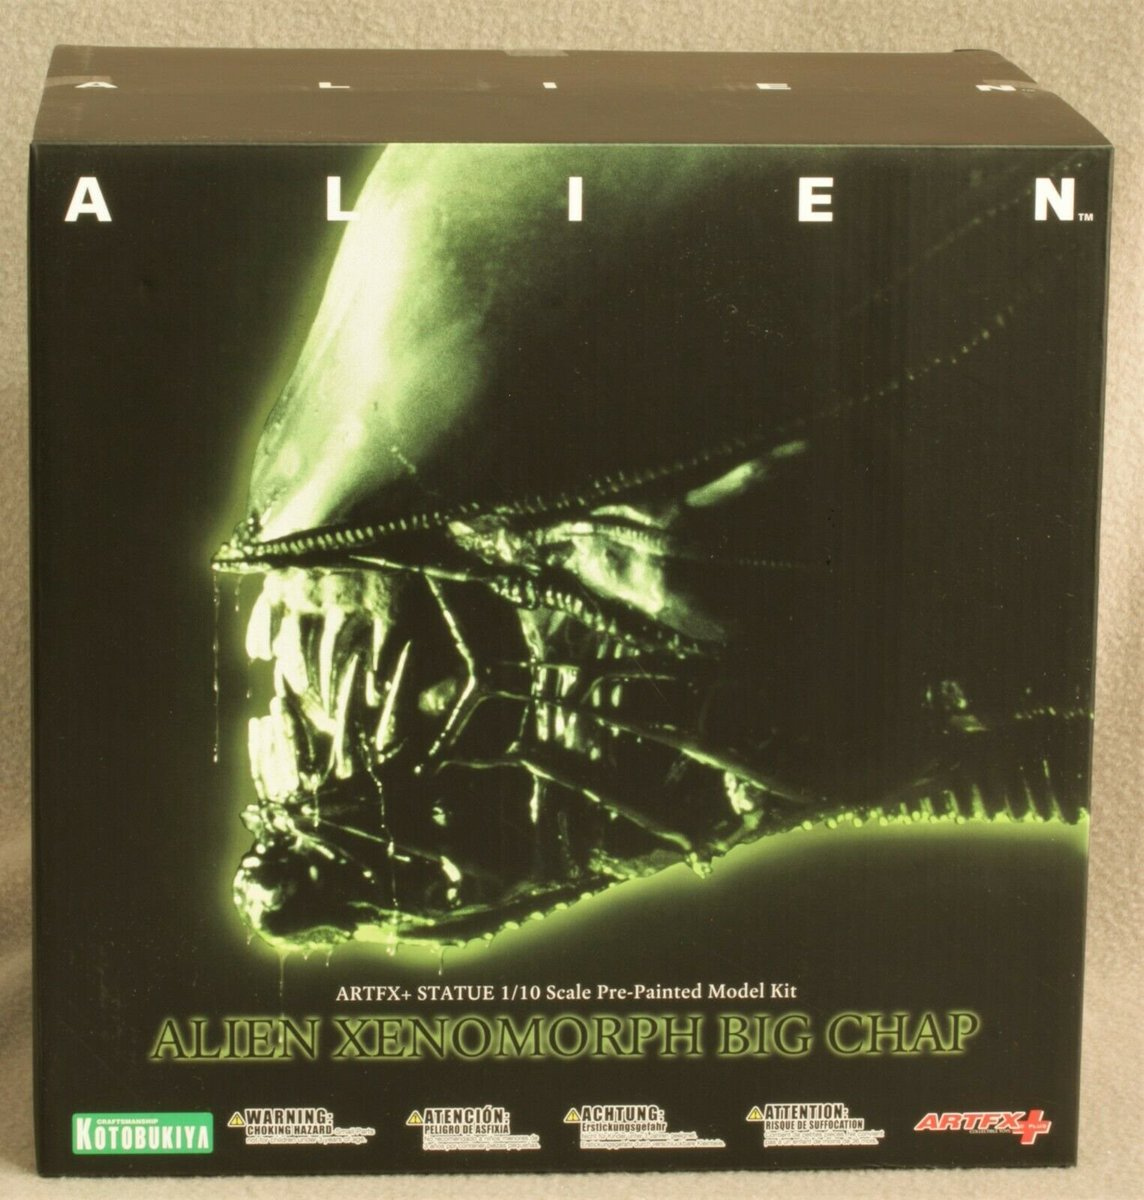 #Spooky stuff #forsale on#Ebay! #scifi #Aliens #Alien #horror #Halloween #Hellraiser #SideshowCollectibles #Collectibles #modelkit #SaturdayThoughts #resin  #FullMoon #PuppetMaster #Blade #kaiju #Xenomorph #statue #artist #Kotobukiya #Exclusive https://t.co/zi16KWMOu7 https://t.co/dxjp5gbaB9